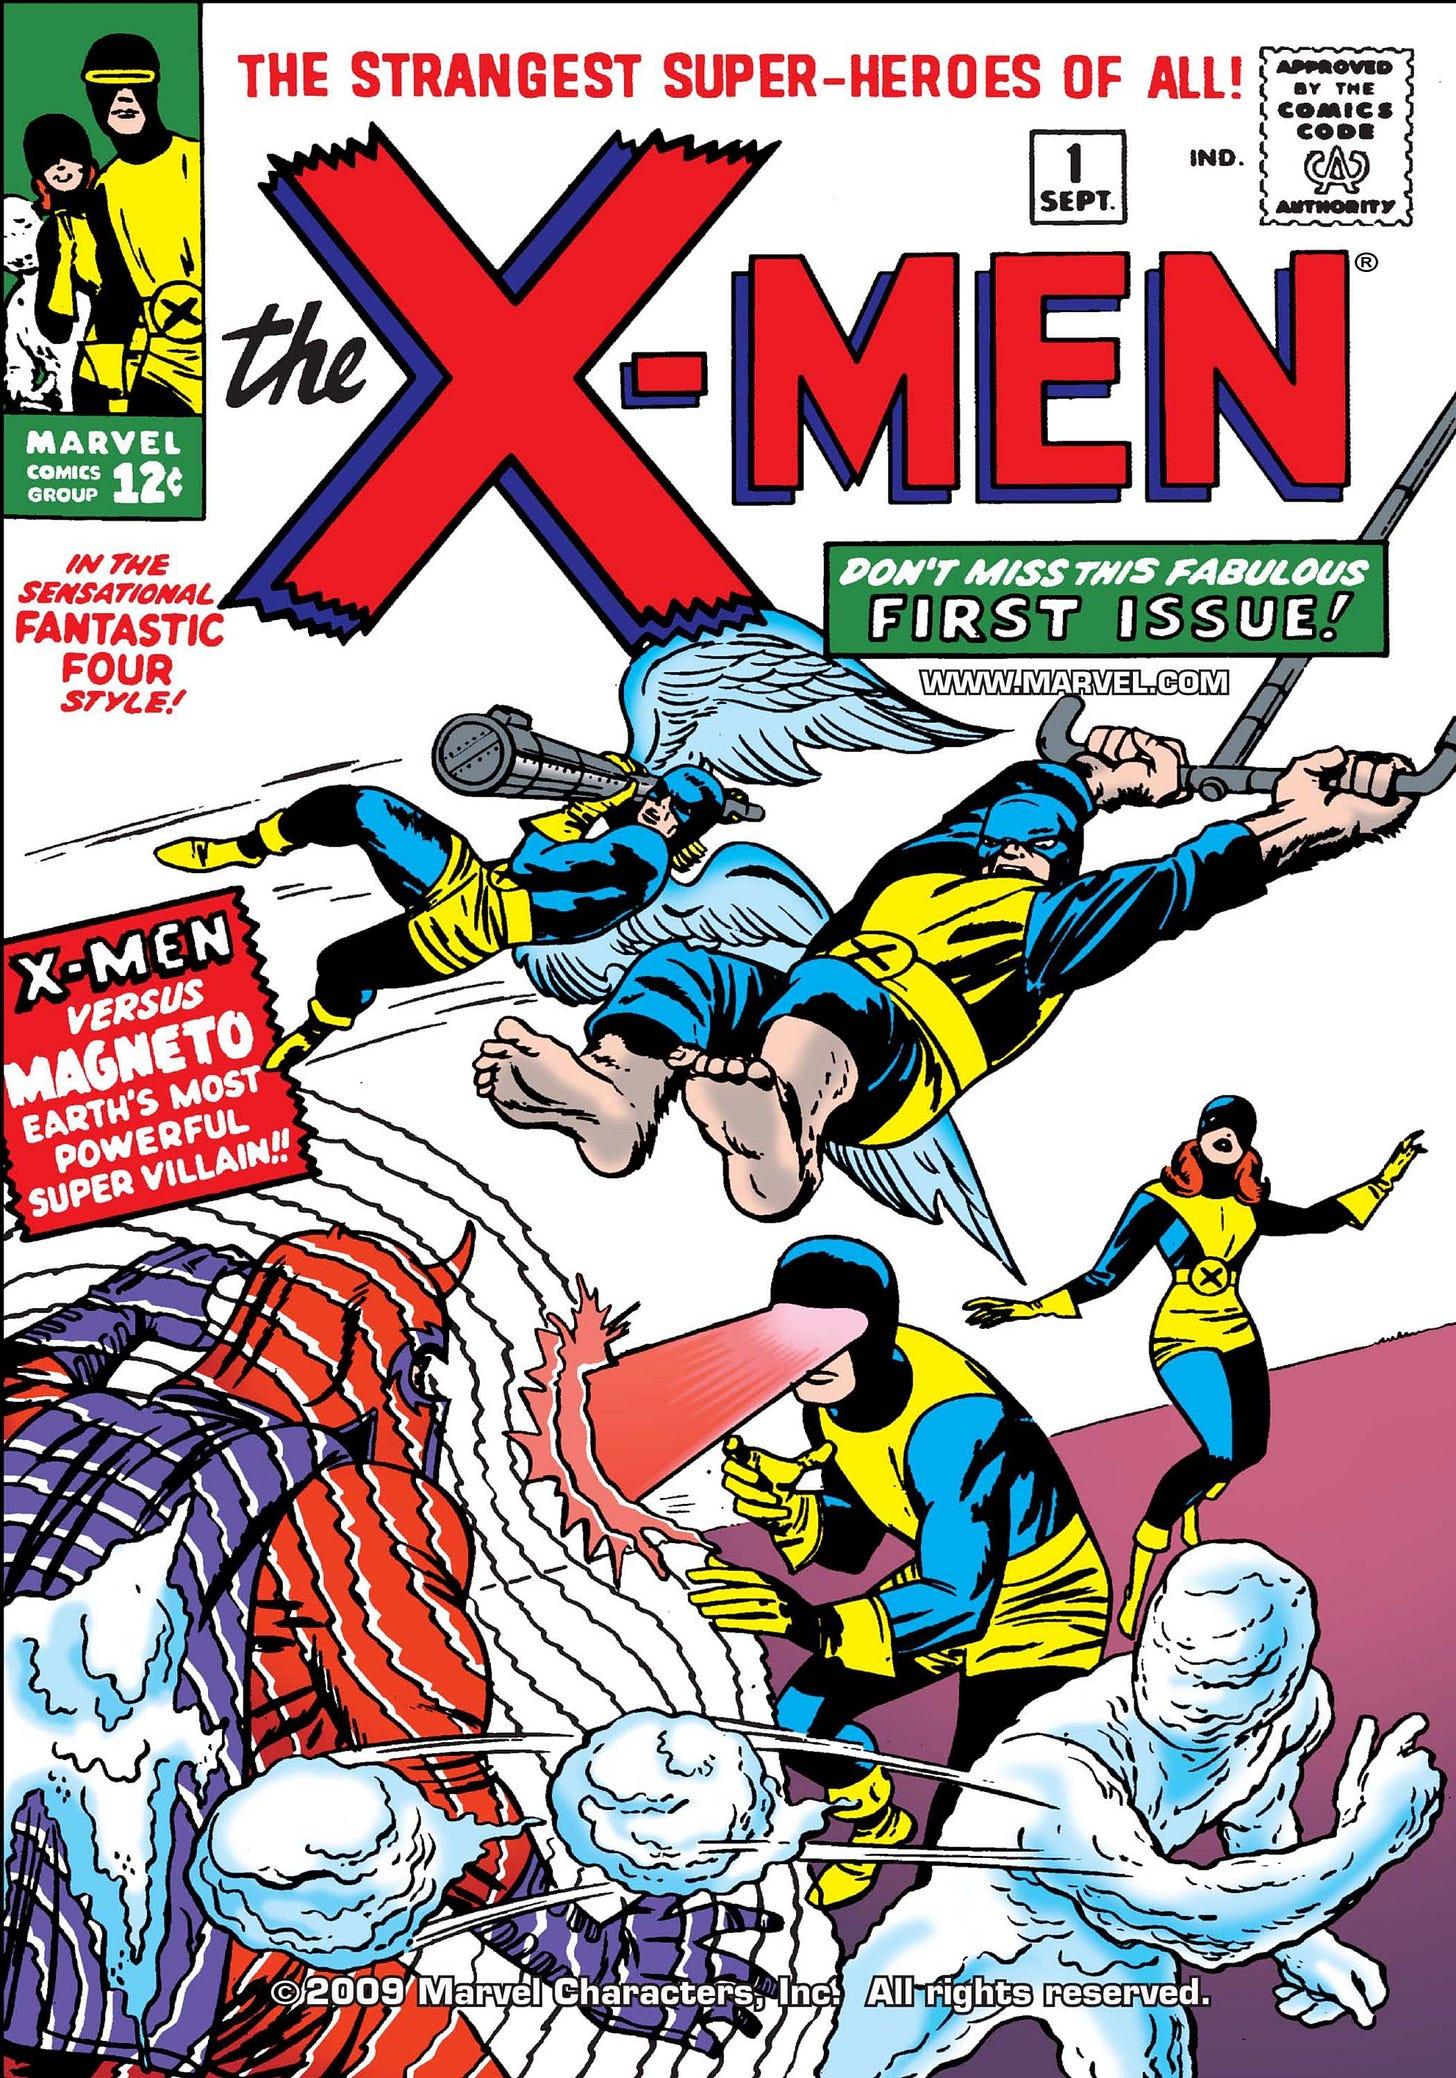 Uncanny X-Men (1963) #1   Comic Issues   Marvel